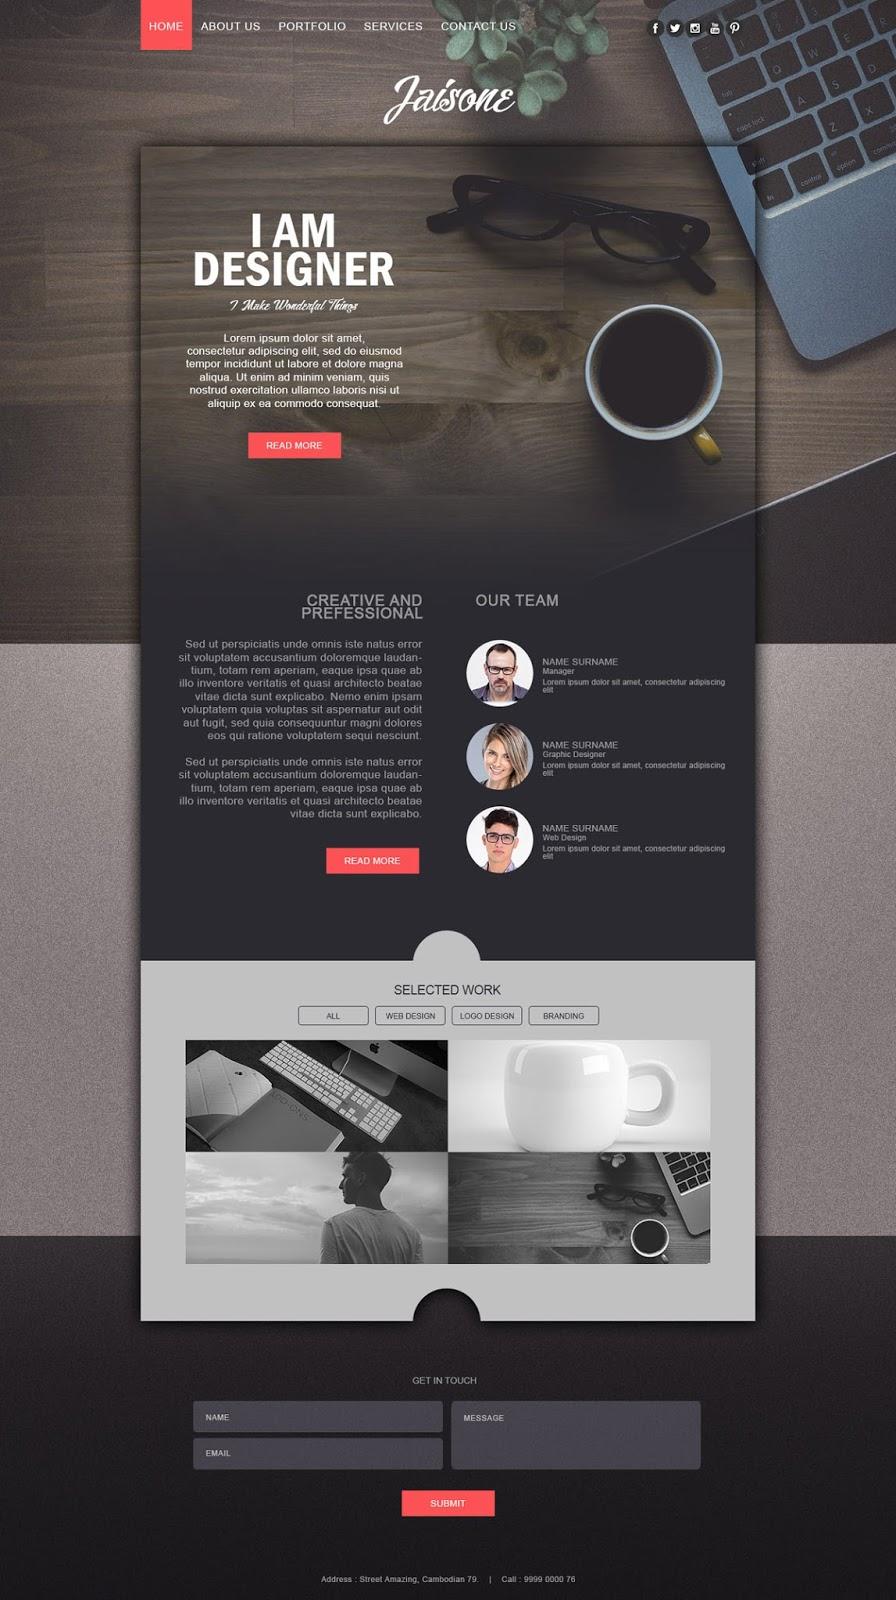 Make a Stylish Portfolio Website Design With Grain Texture In Photoshop